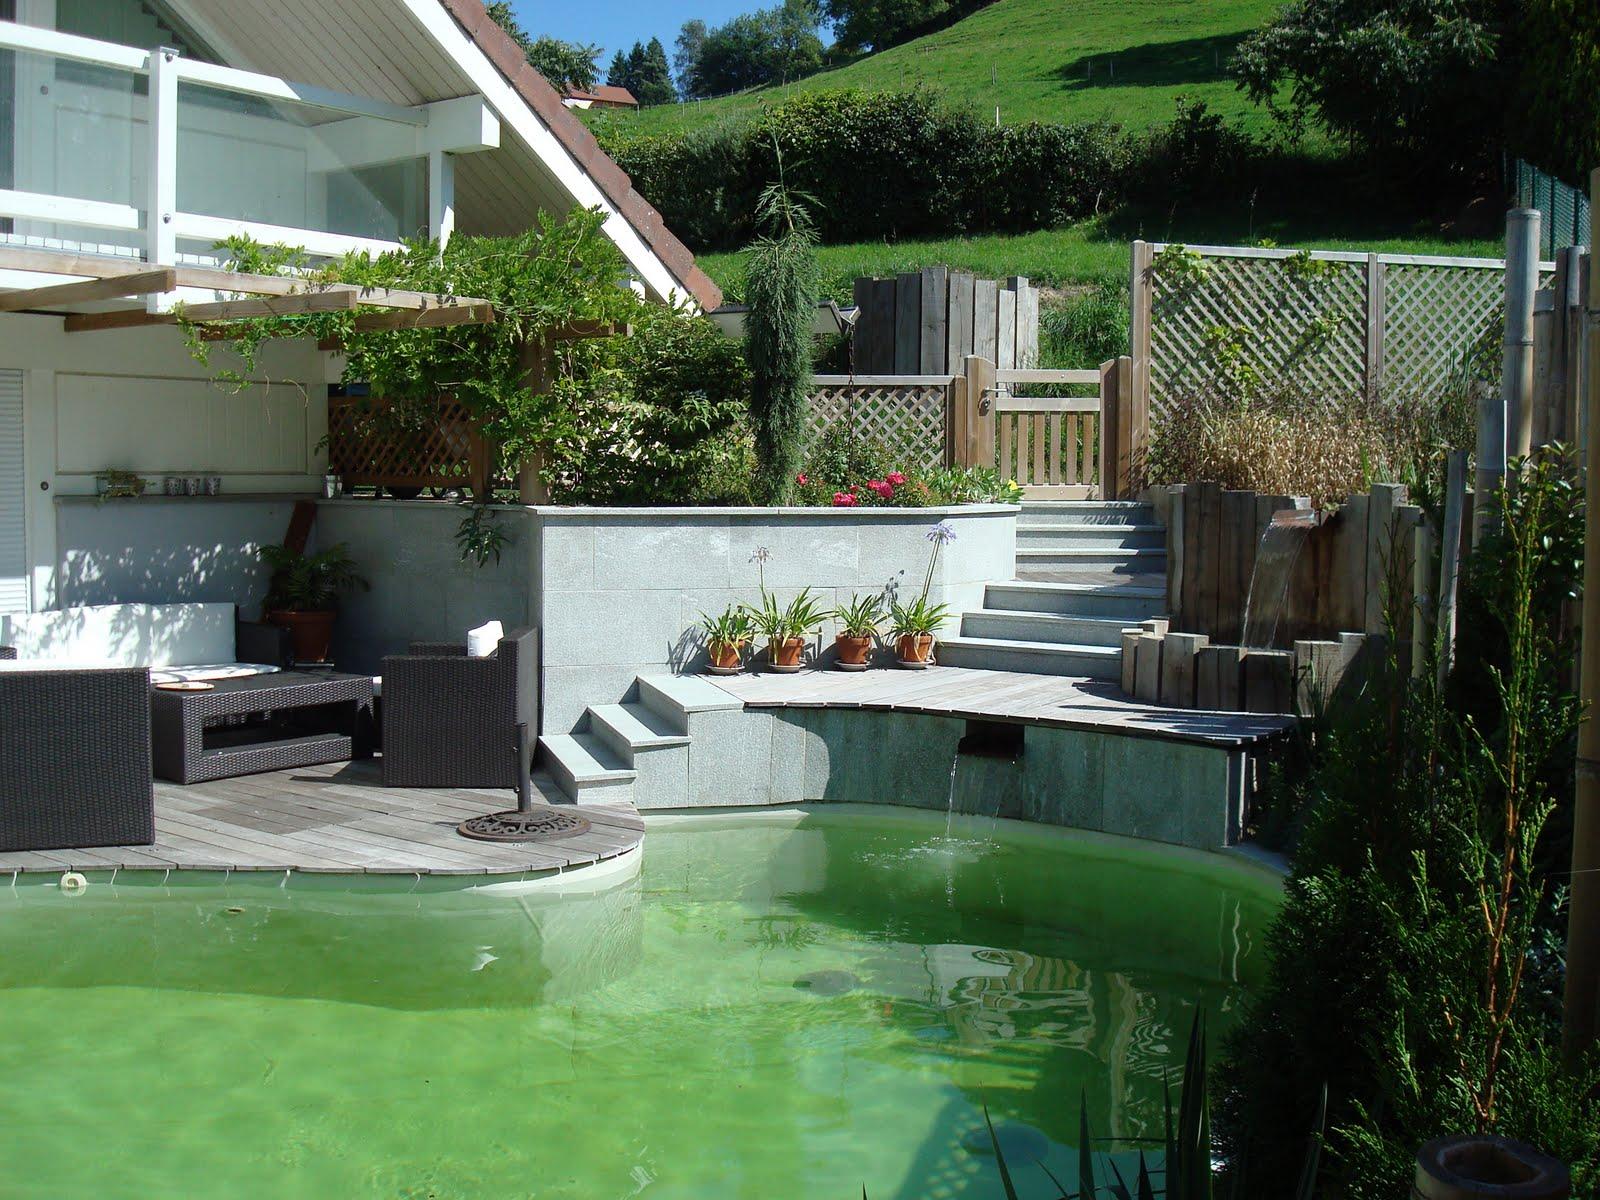 paysagiste et am nagement de jardin thonon et annemasse piscine naturelle. Black Bedroom Furniture Sets. Home Design Ideas